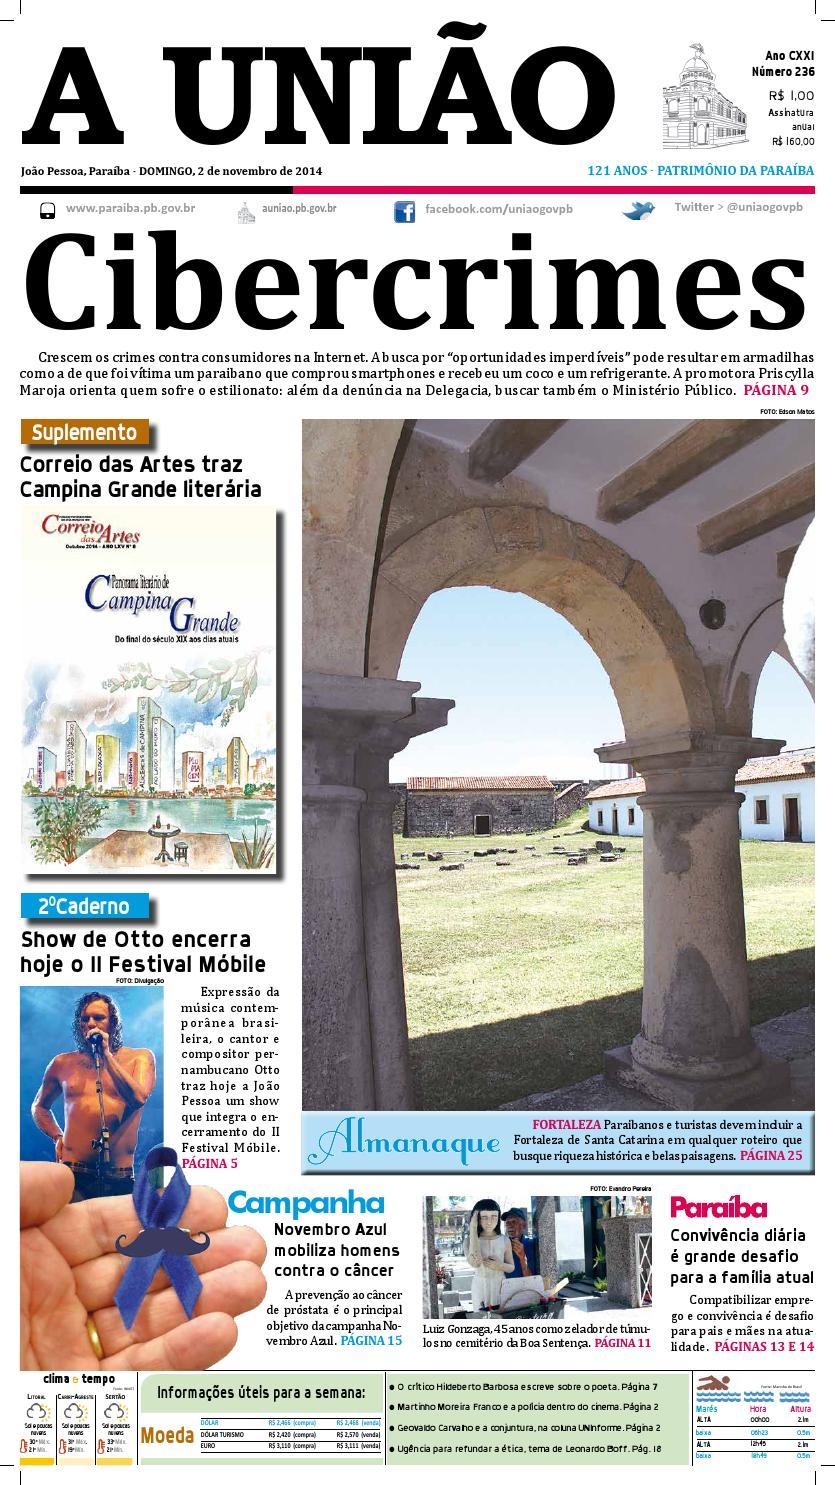 Jornal A União by Jornal A União - issuu 4ca78437a7991